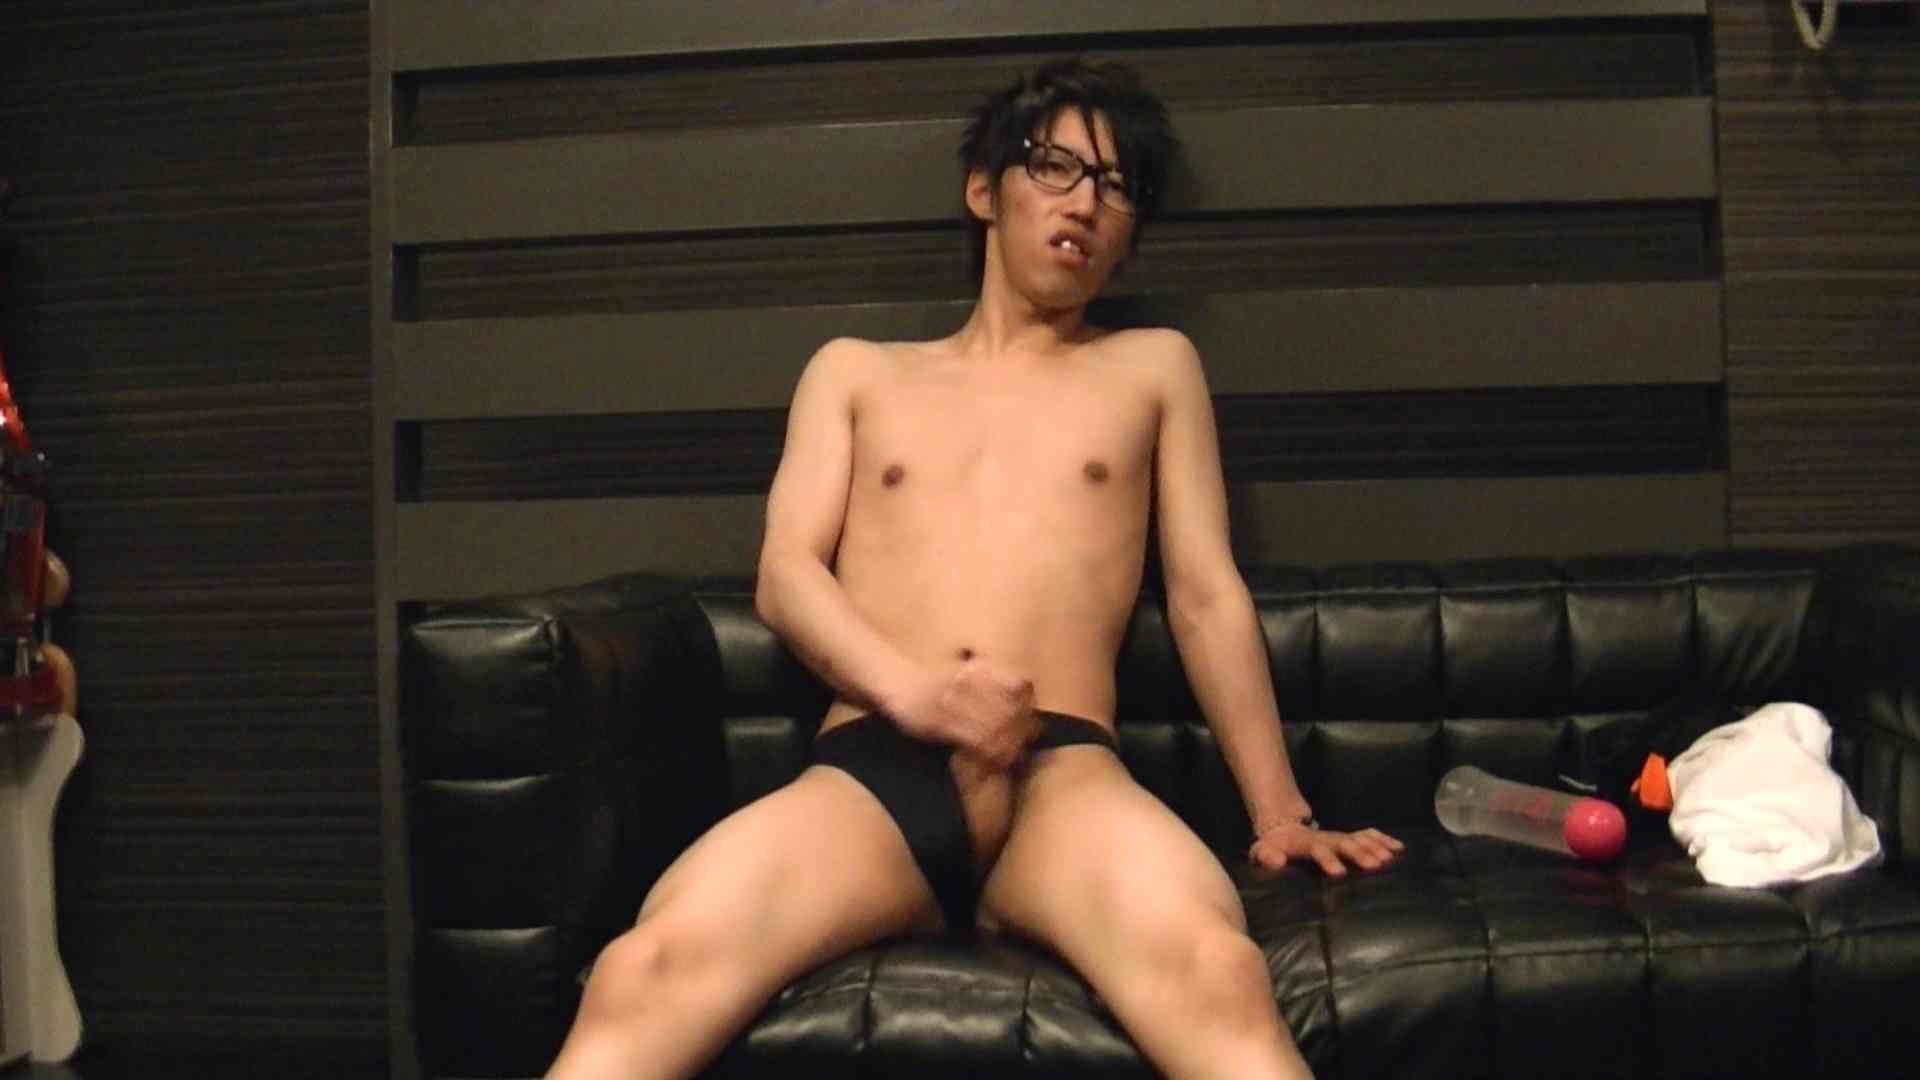 Mr.オナックスさん投稿!HD 貴方のオナニー三万円で撮影させてください。VOL.04 スリム美少年系ジャニ系 ゲイエロビデオ画像 55連発 48